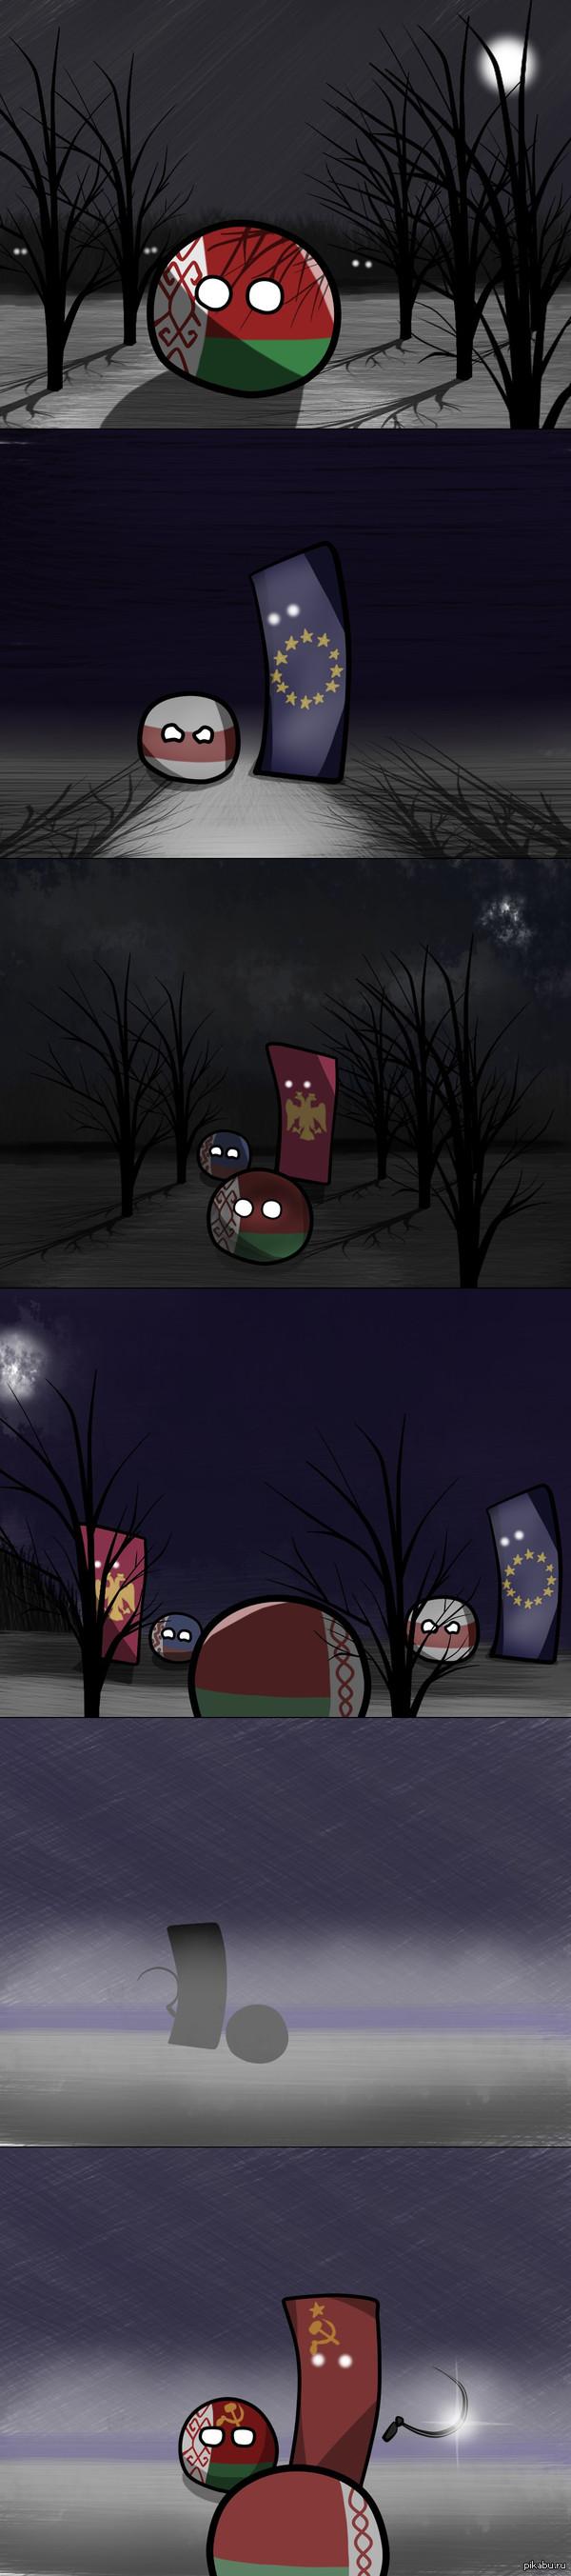 Три пути